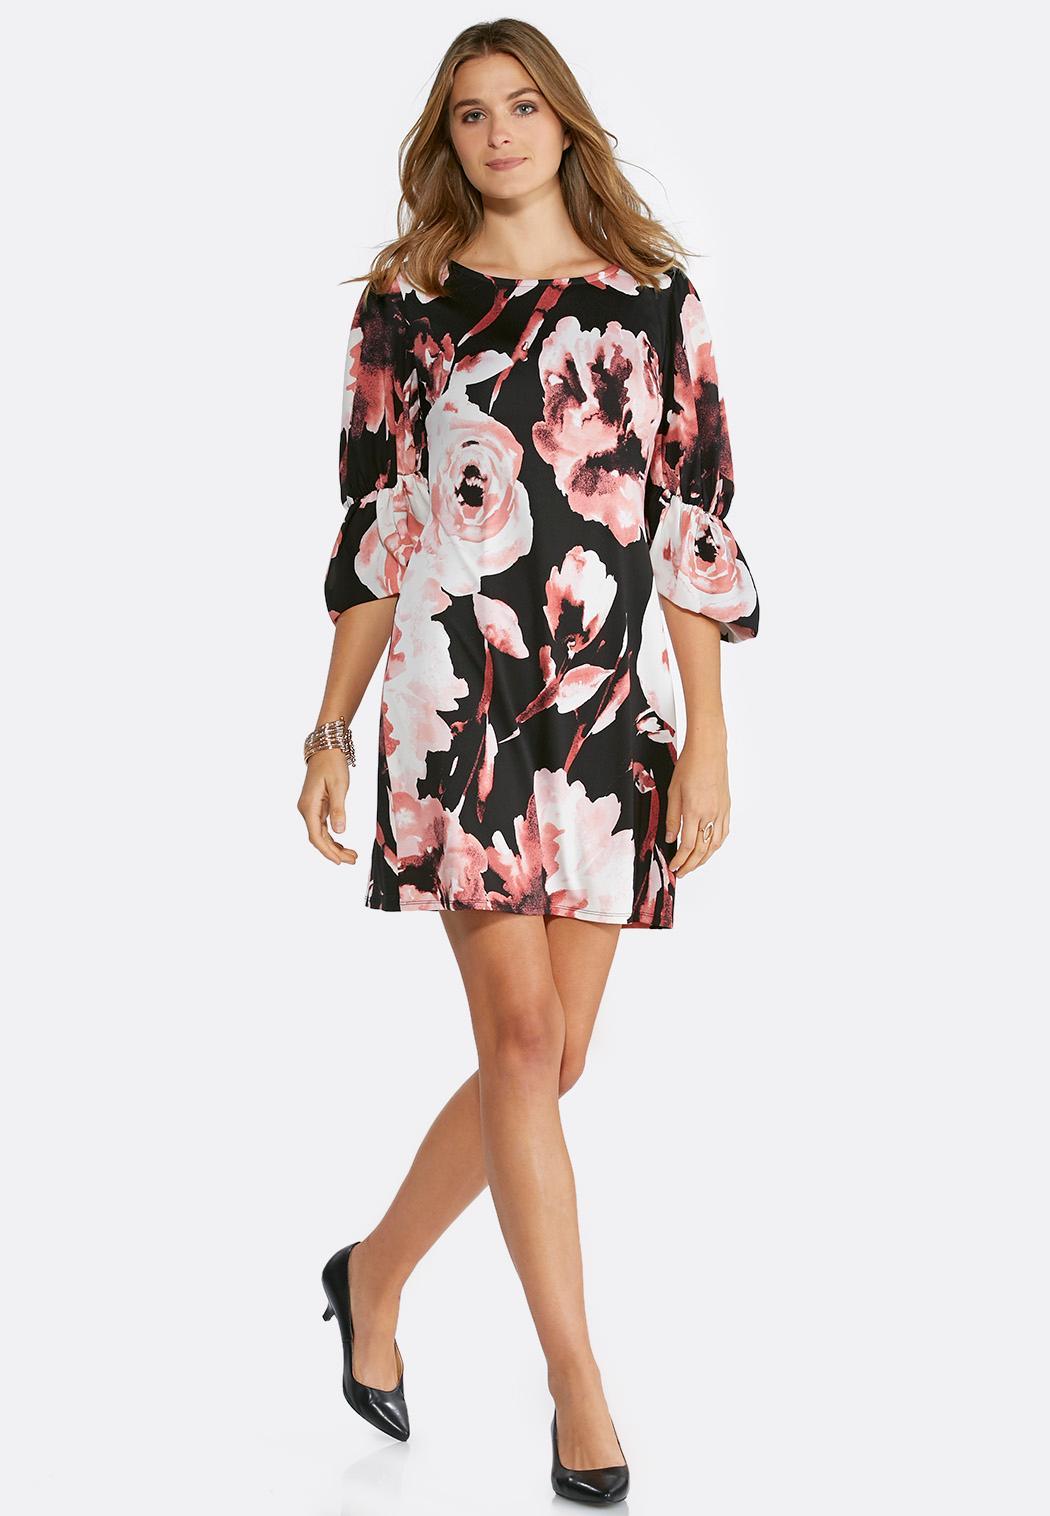 Plus Size Floral Balloon Sleeve Dress Plus Sizes Cato Fashions